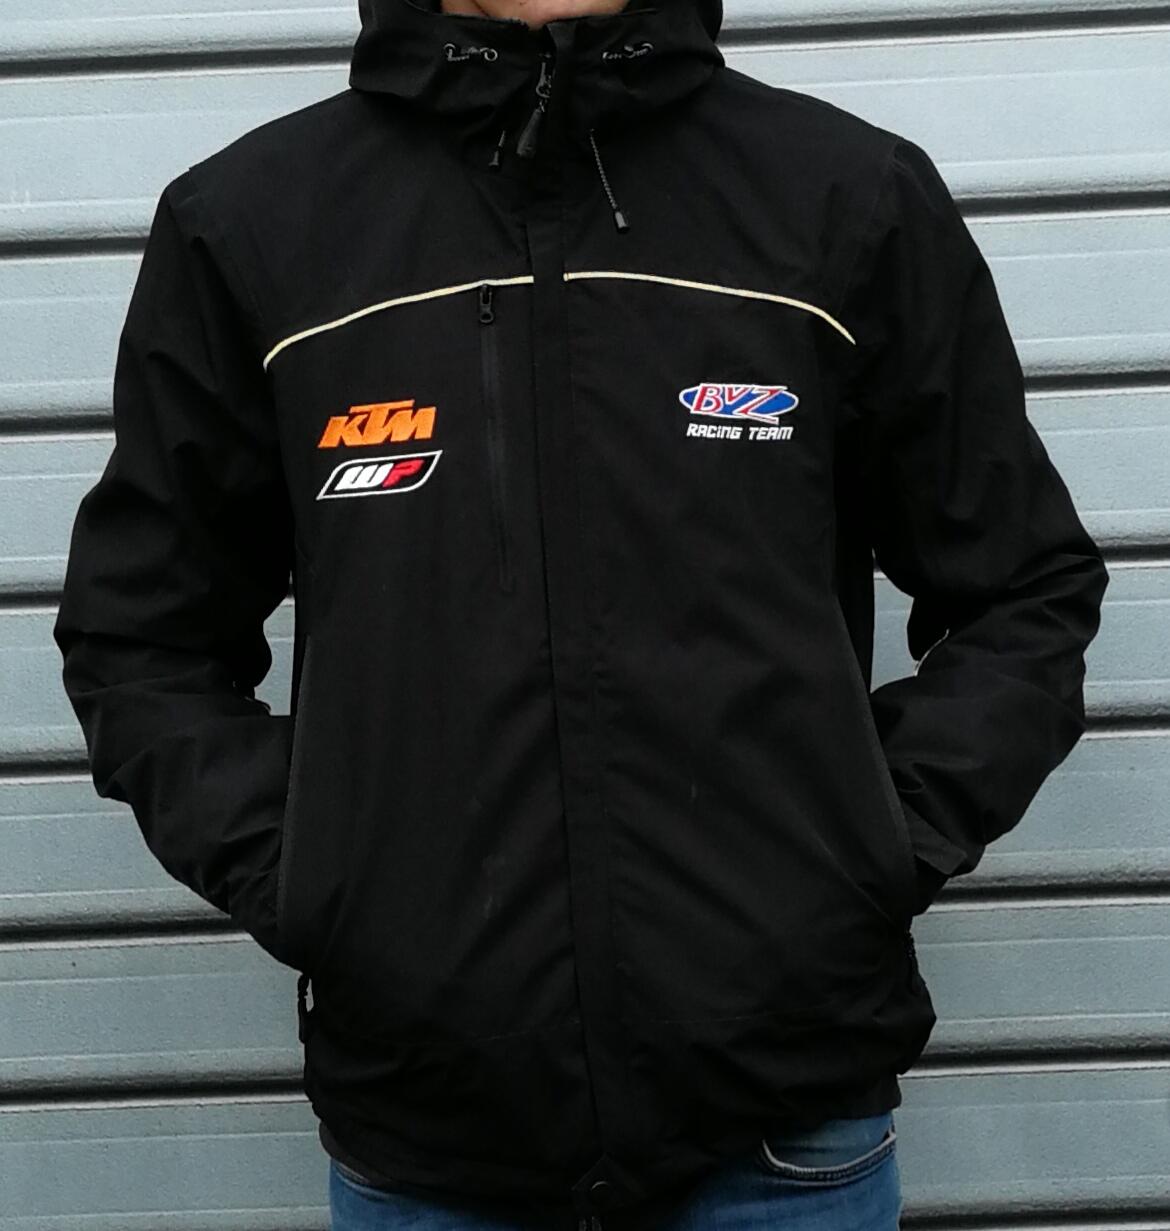 BvZ Racing Team Jacke